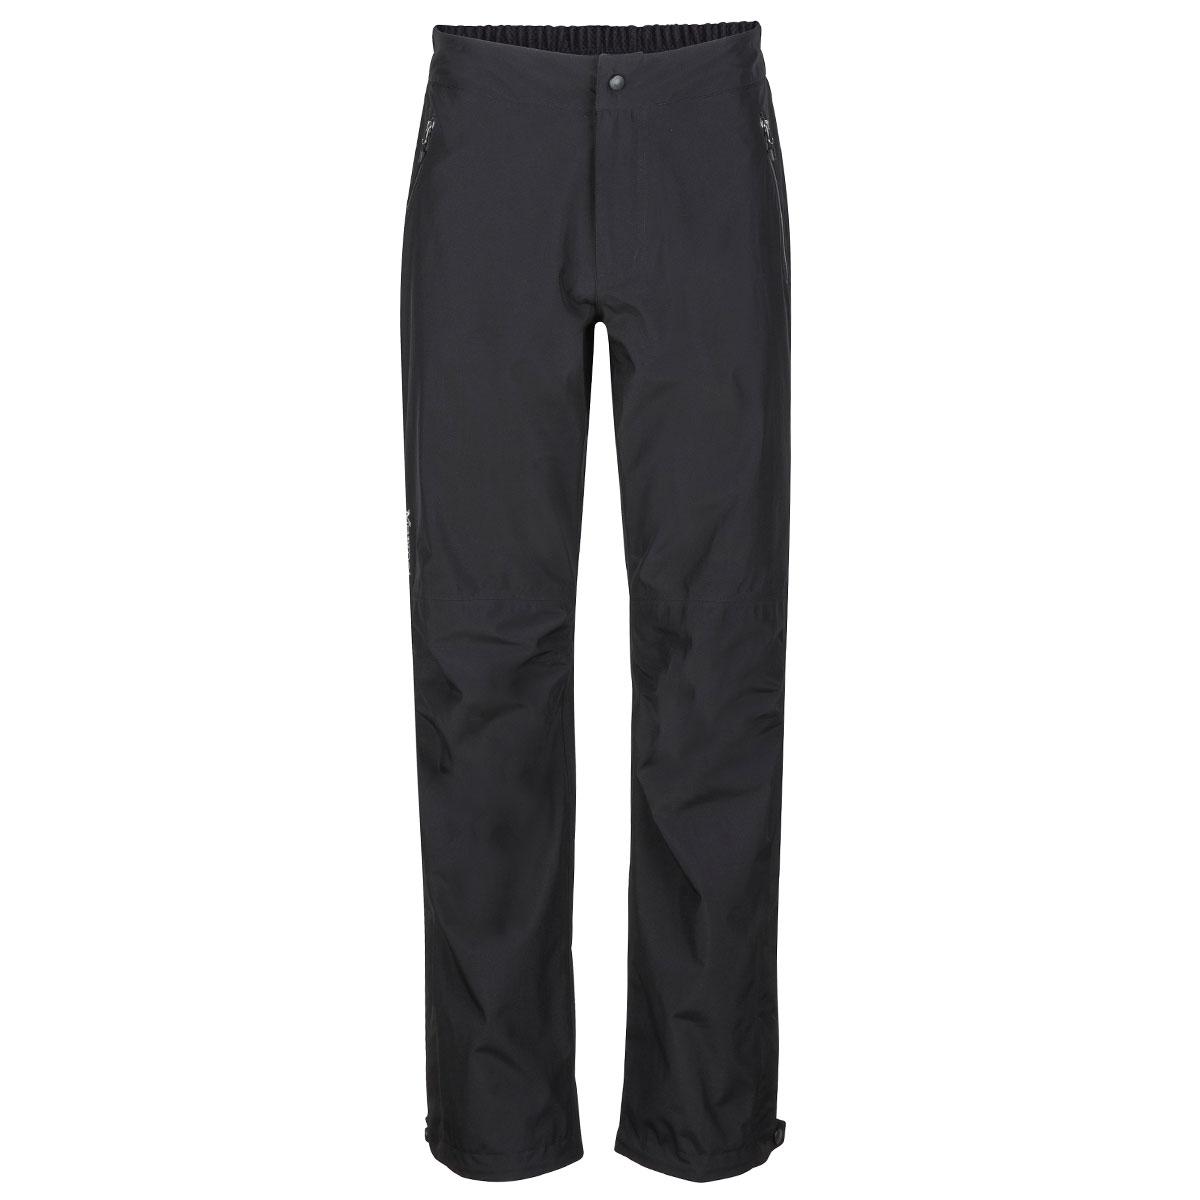 Marmot Men's Minimalist Waterproof Pants - Black, L